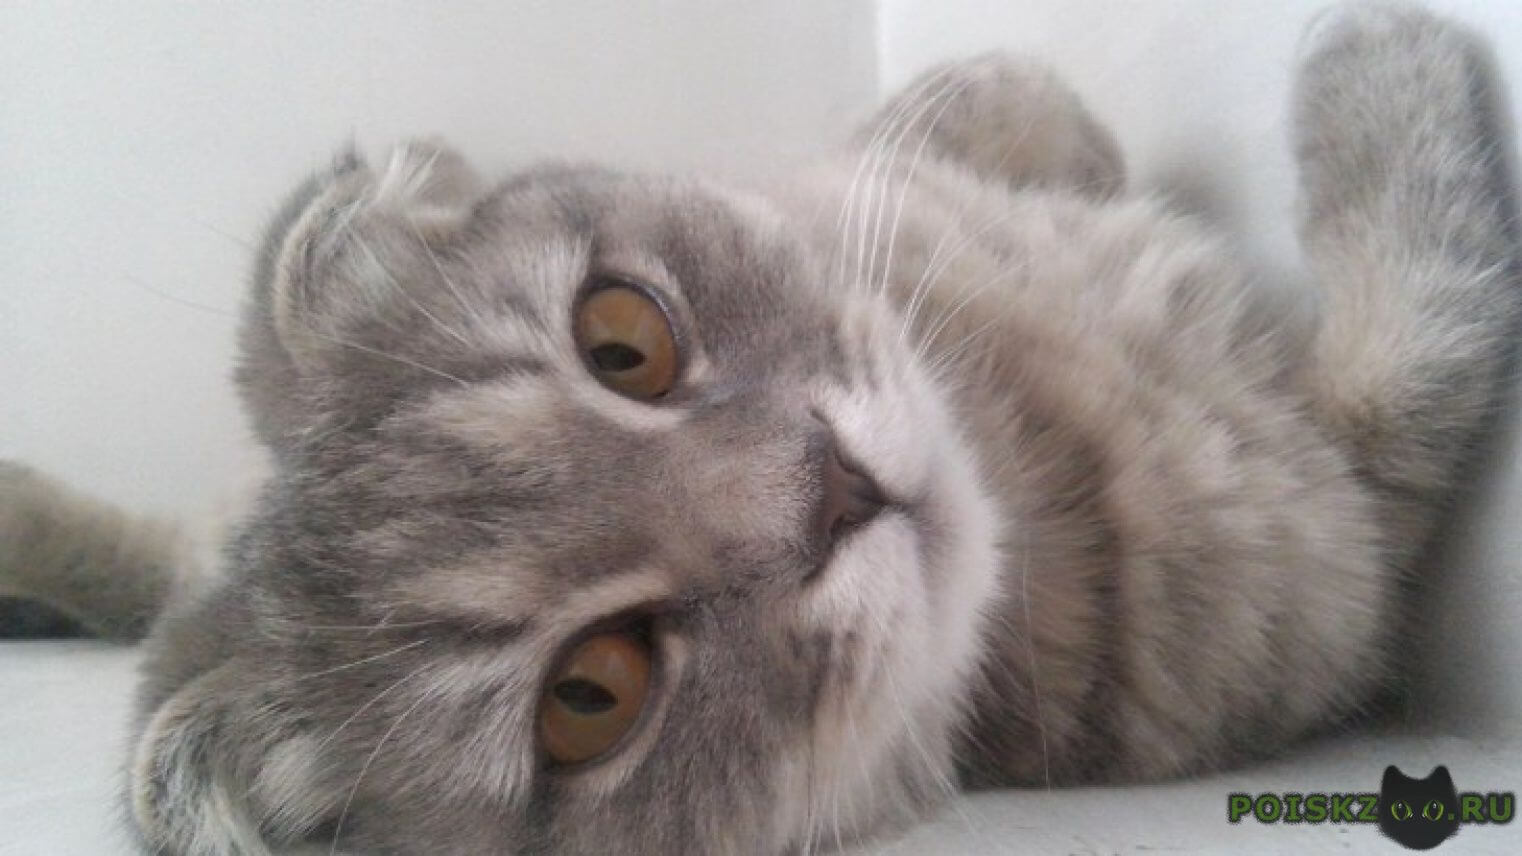 Пропала кошка вислоухая пушка г.Краснодар